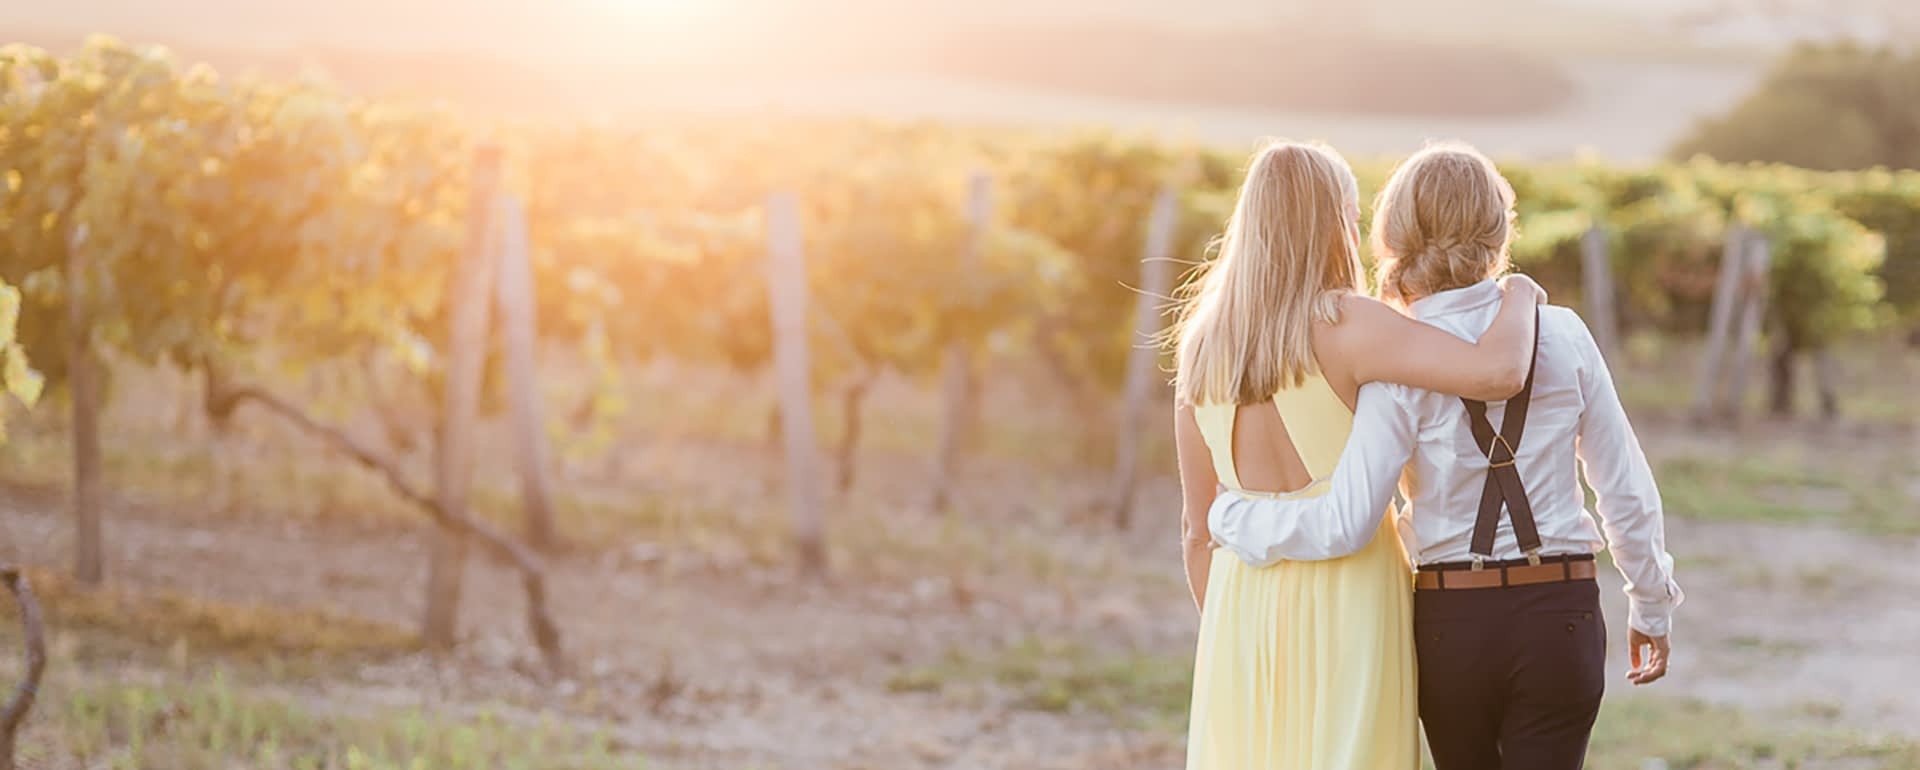 Destination Weddings – Where to Begin?